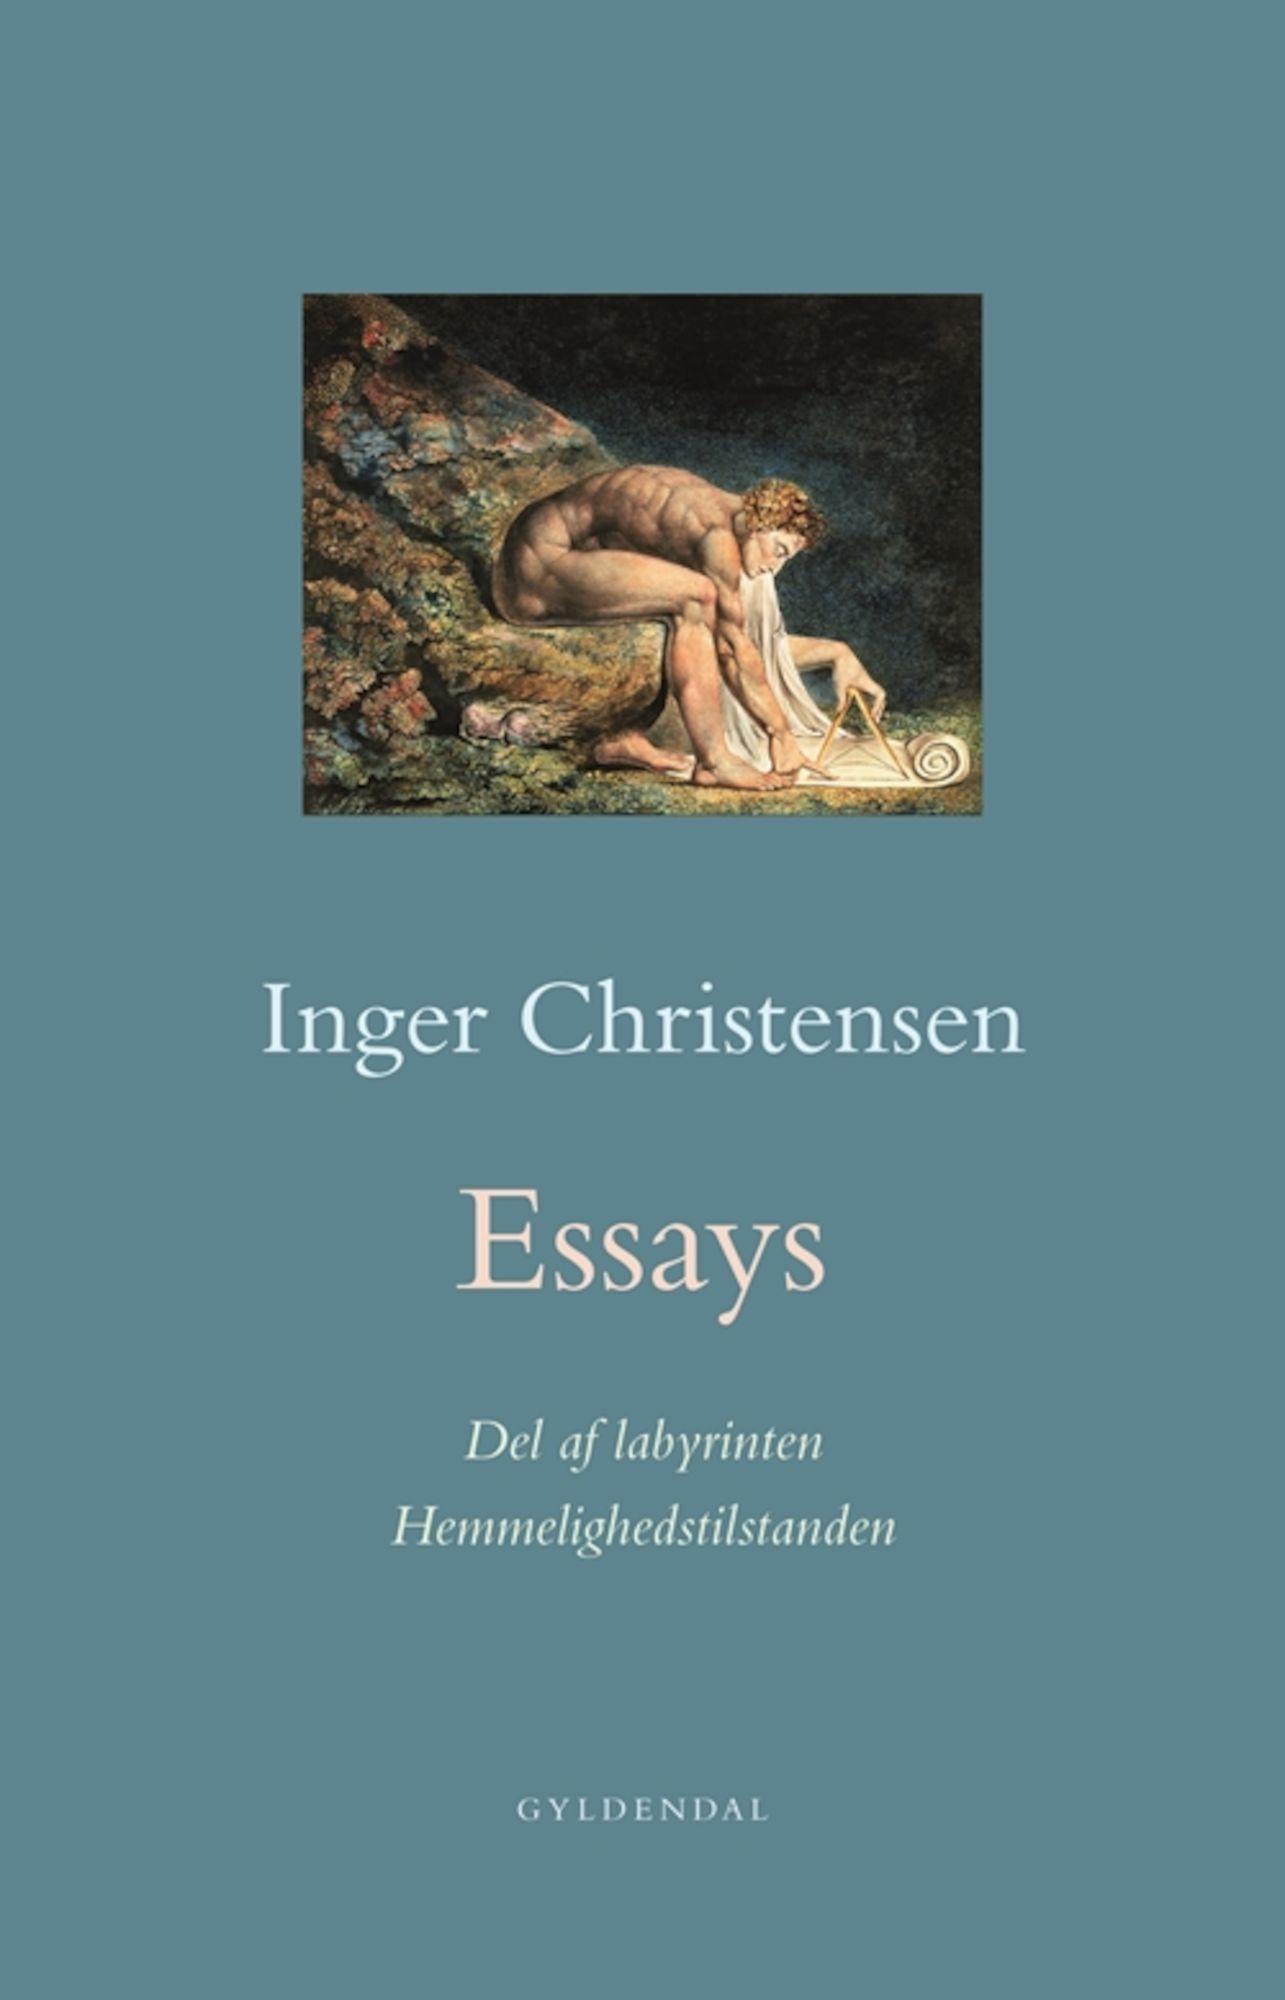 essays-3591607